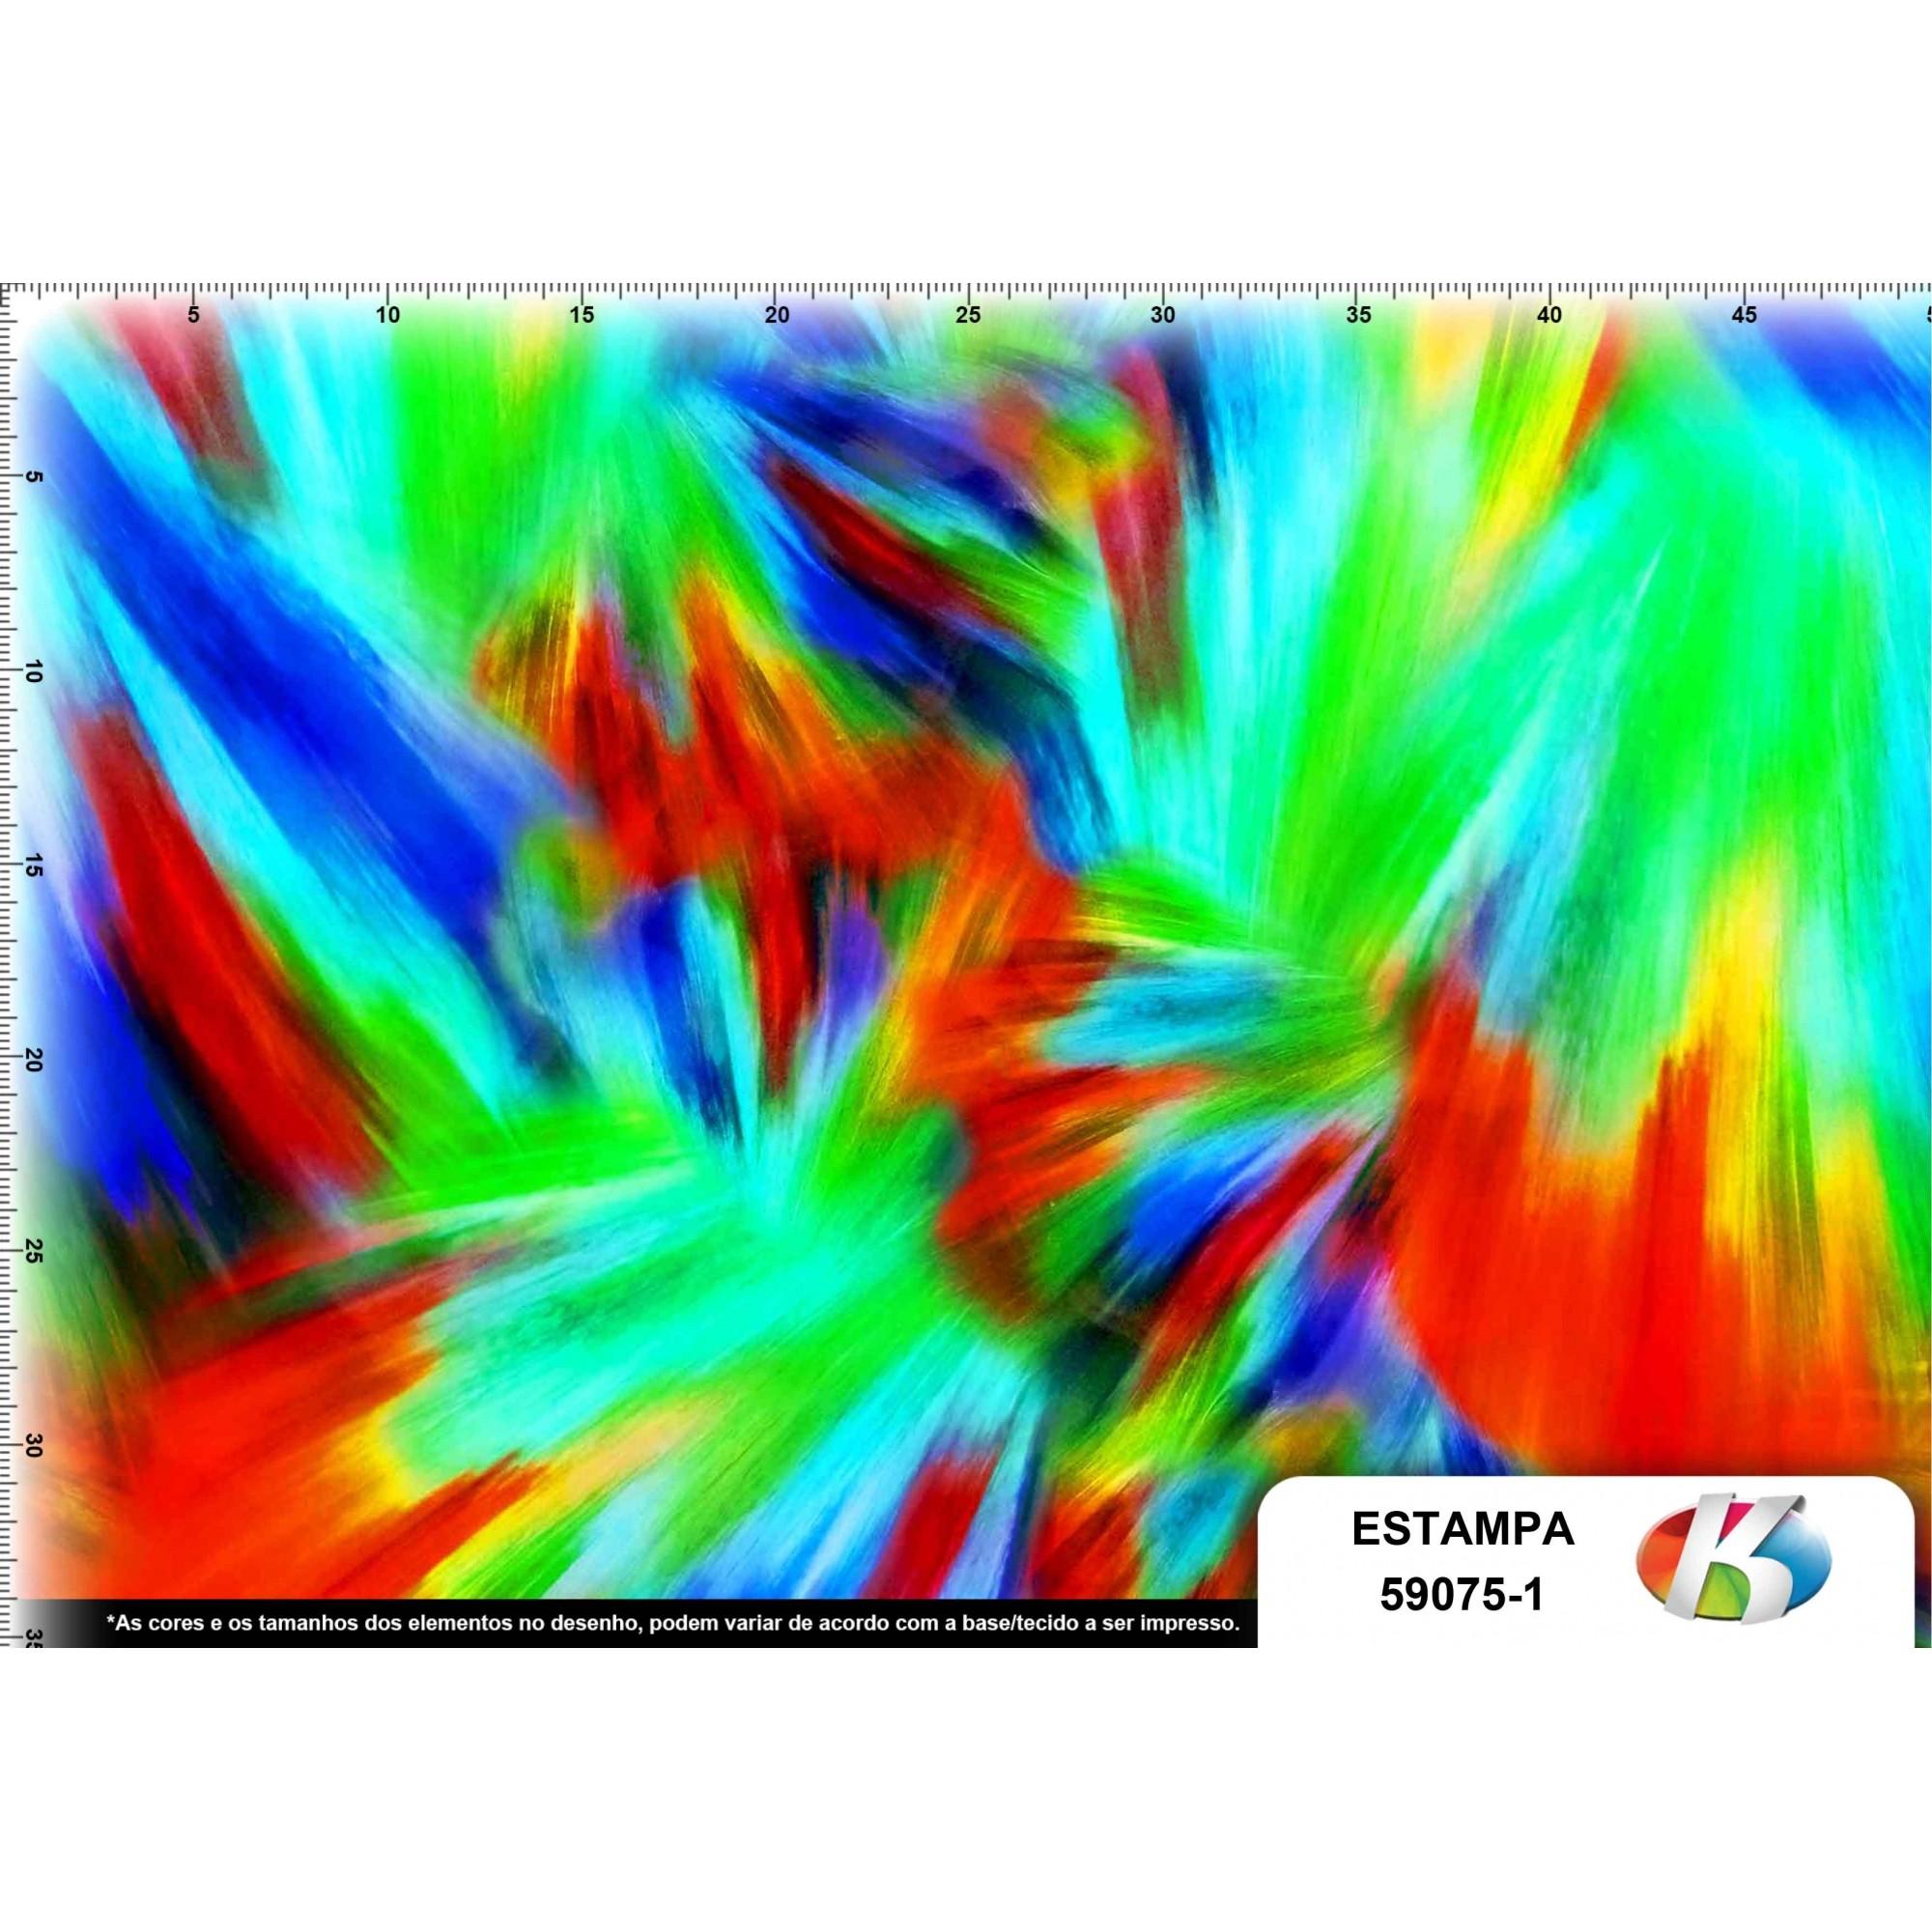 Meryl Digital Estampado (59075-1)